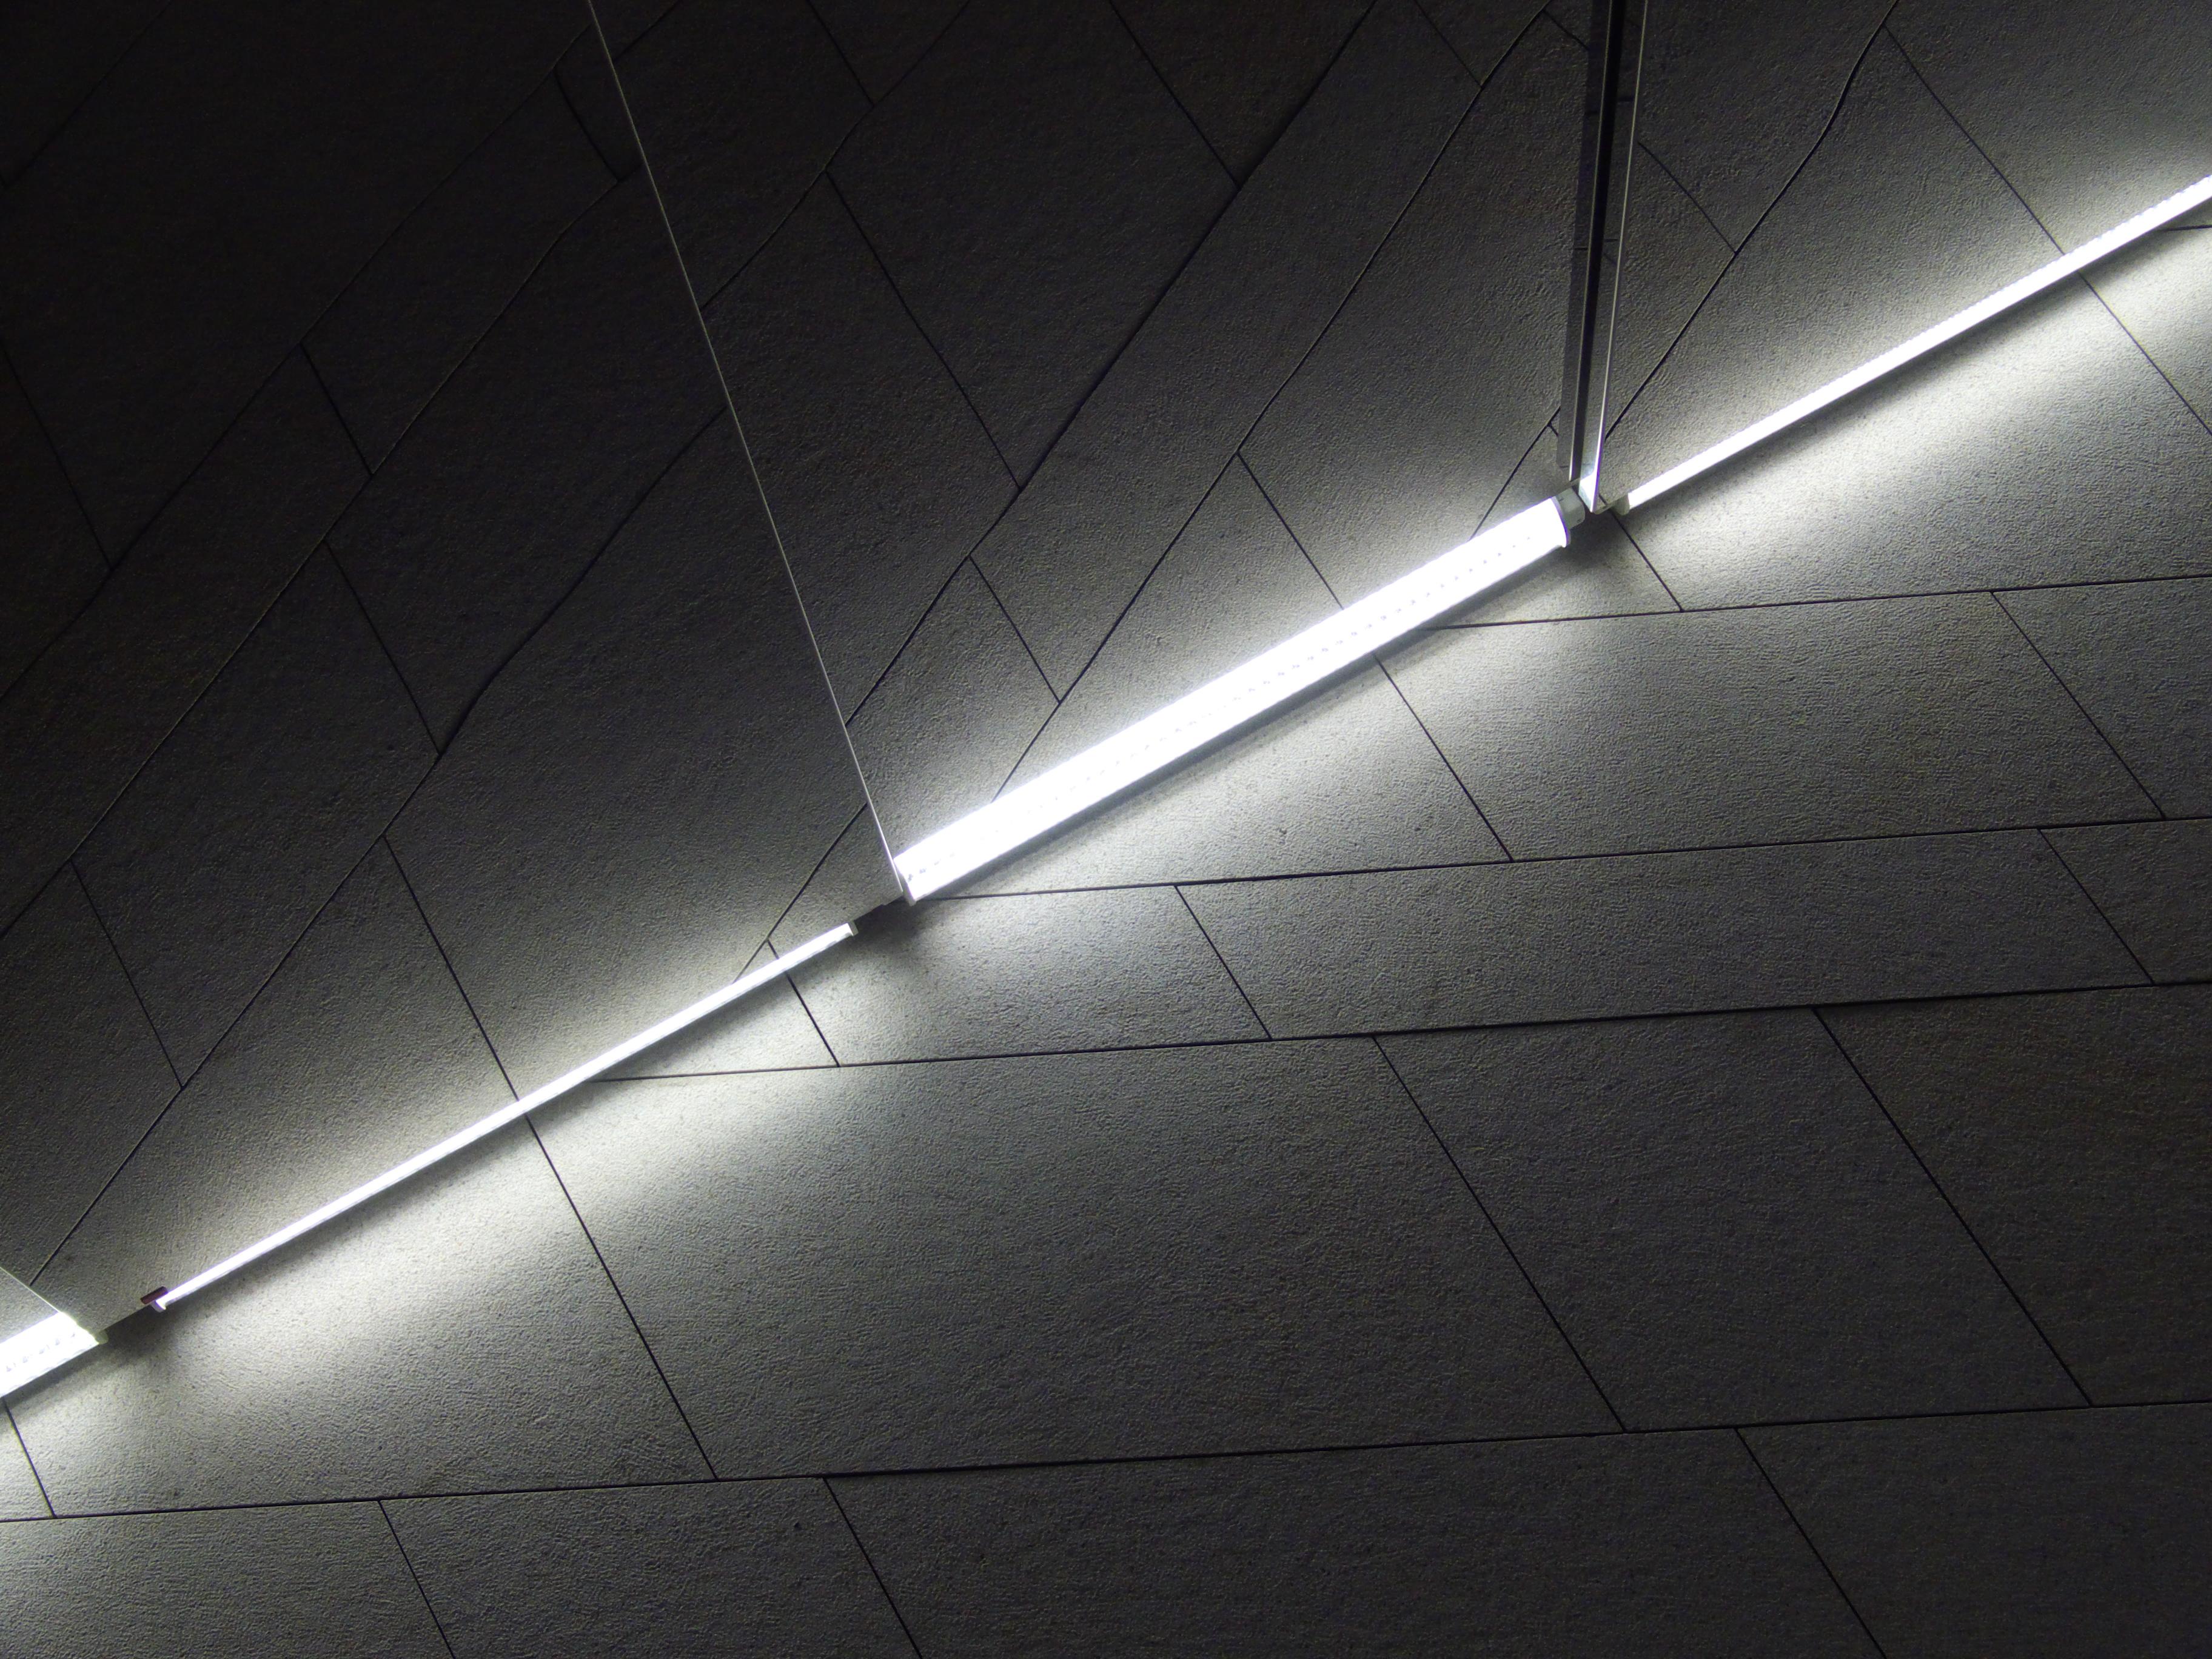 Lichtdesign München wallpaper light white black monochrome abstract